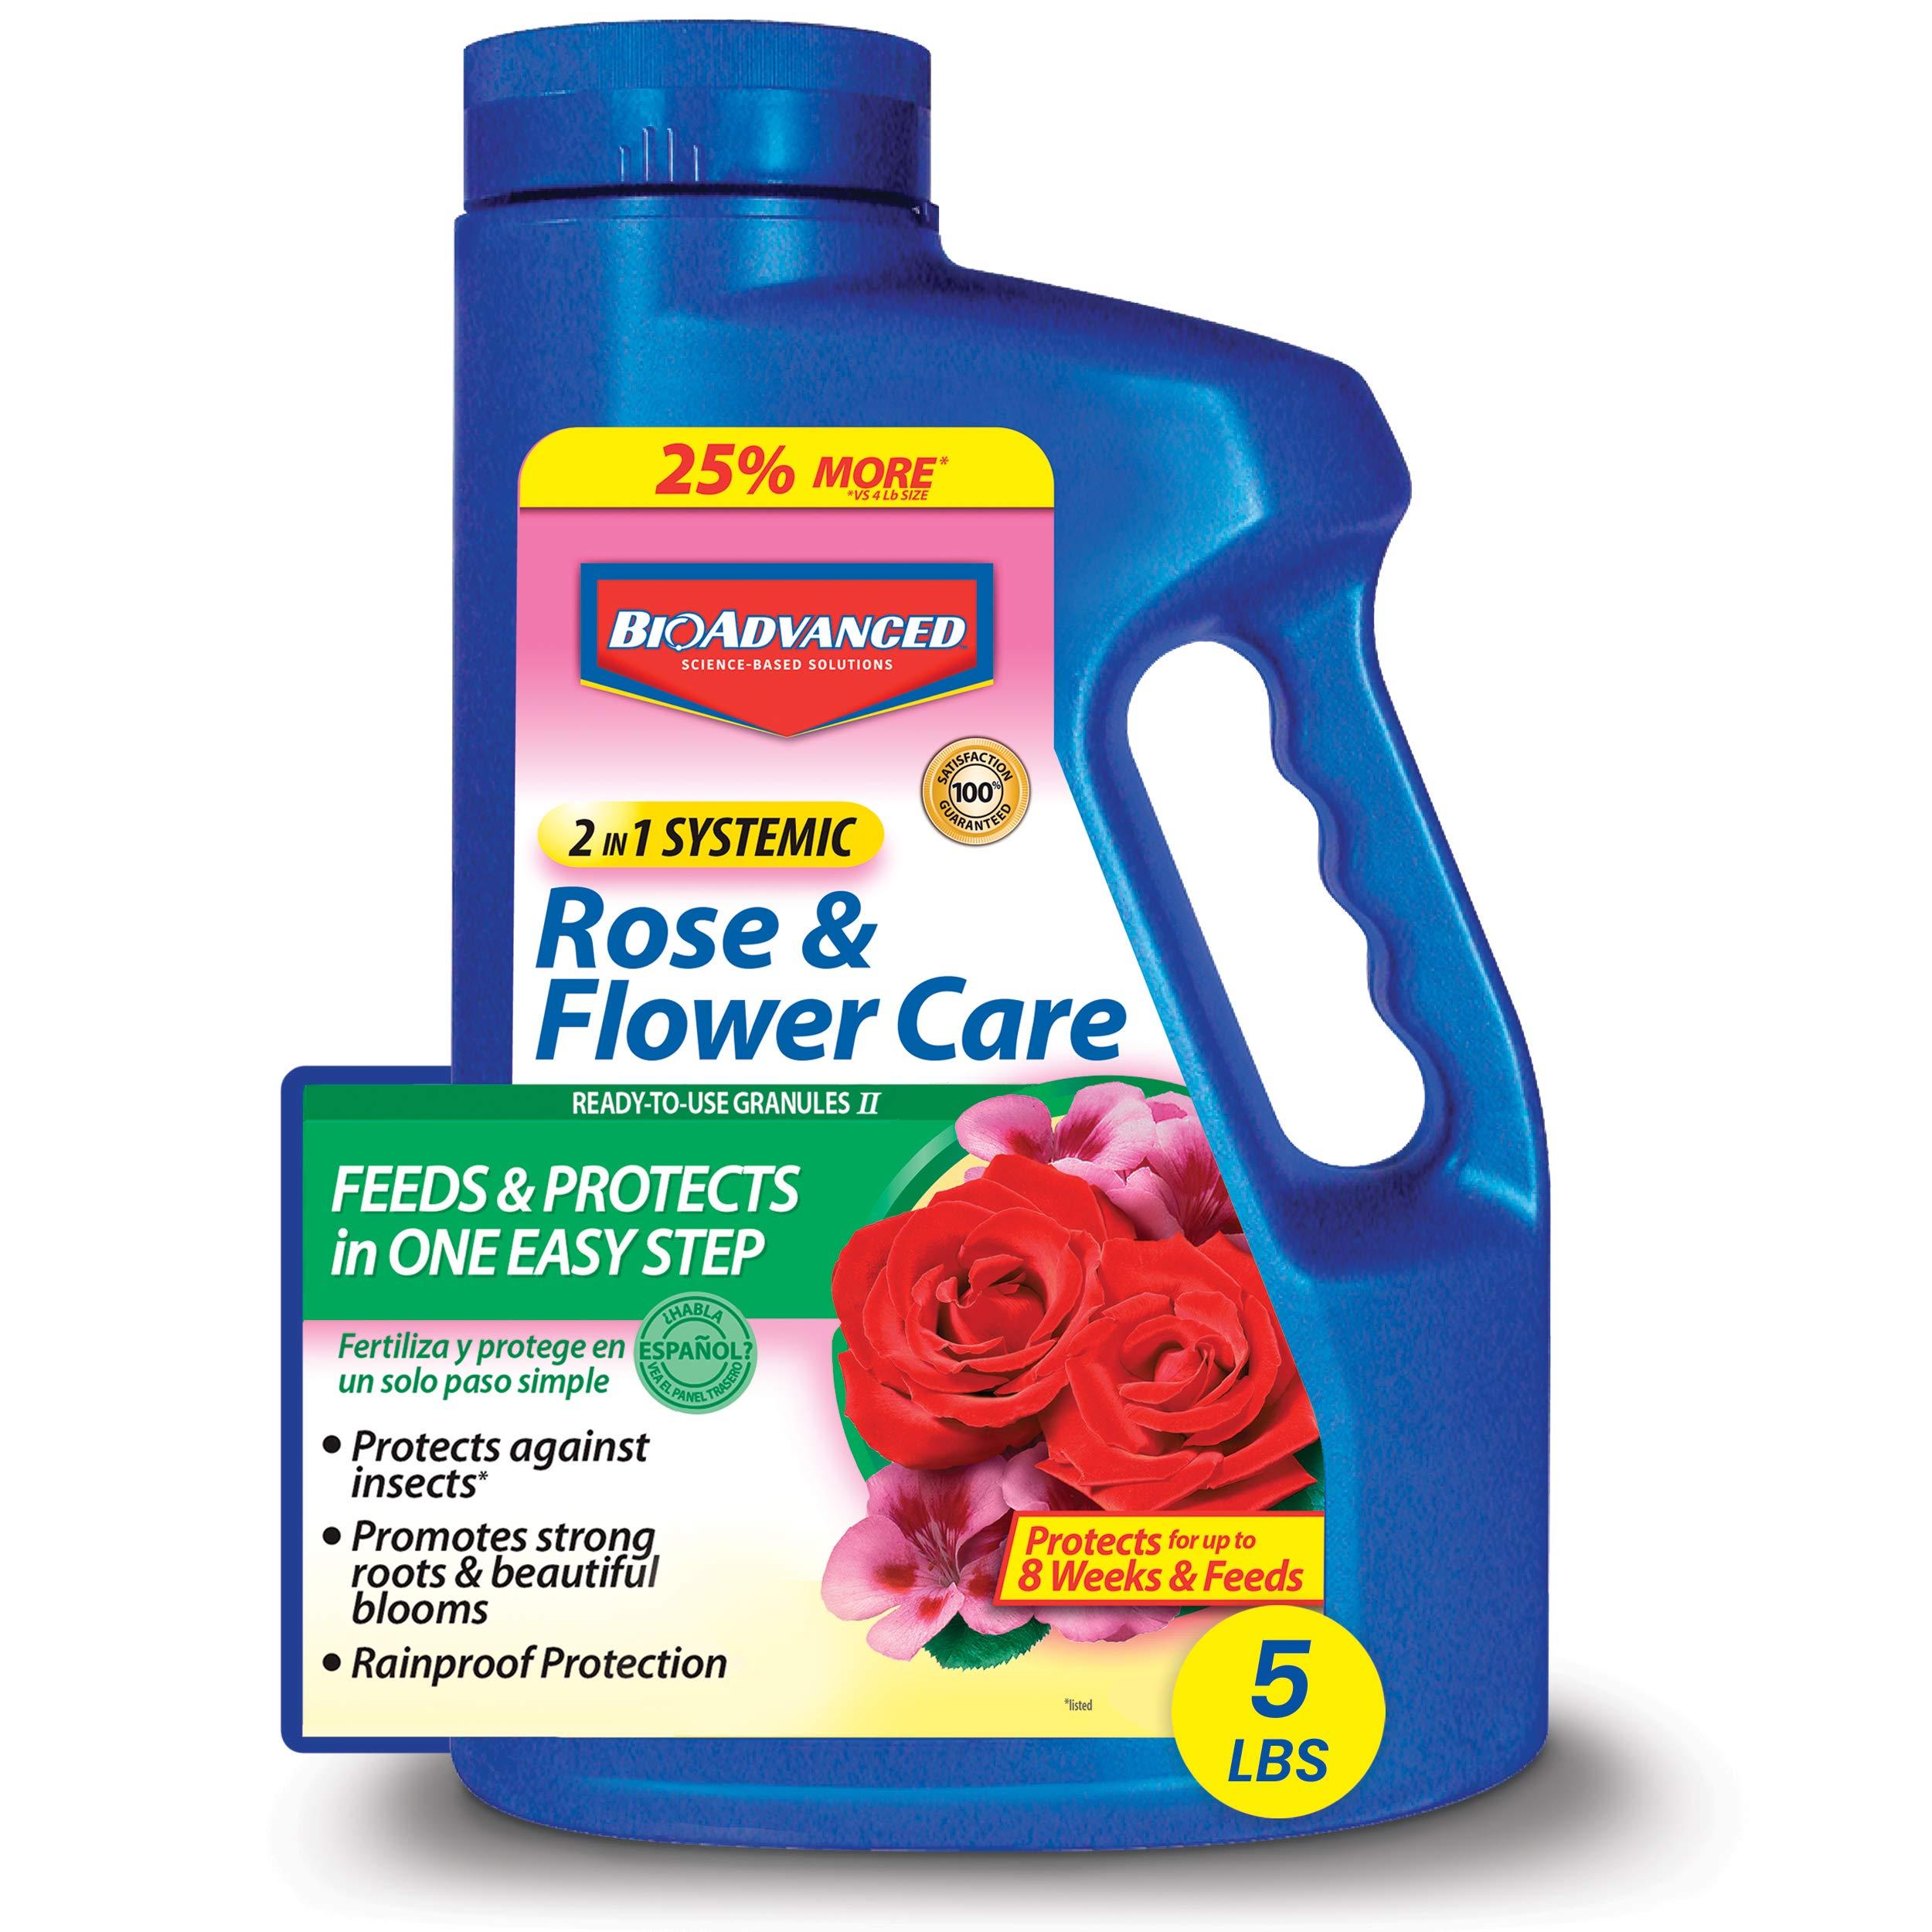 BioAdvanced 701100A 2-in-1 Systemic Rose & Flower Care Fertilizer, Insect Killer, 5-Pound, Granules